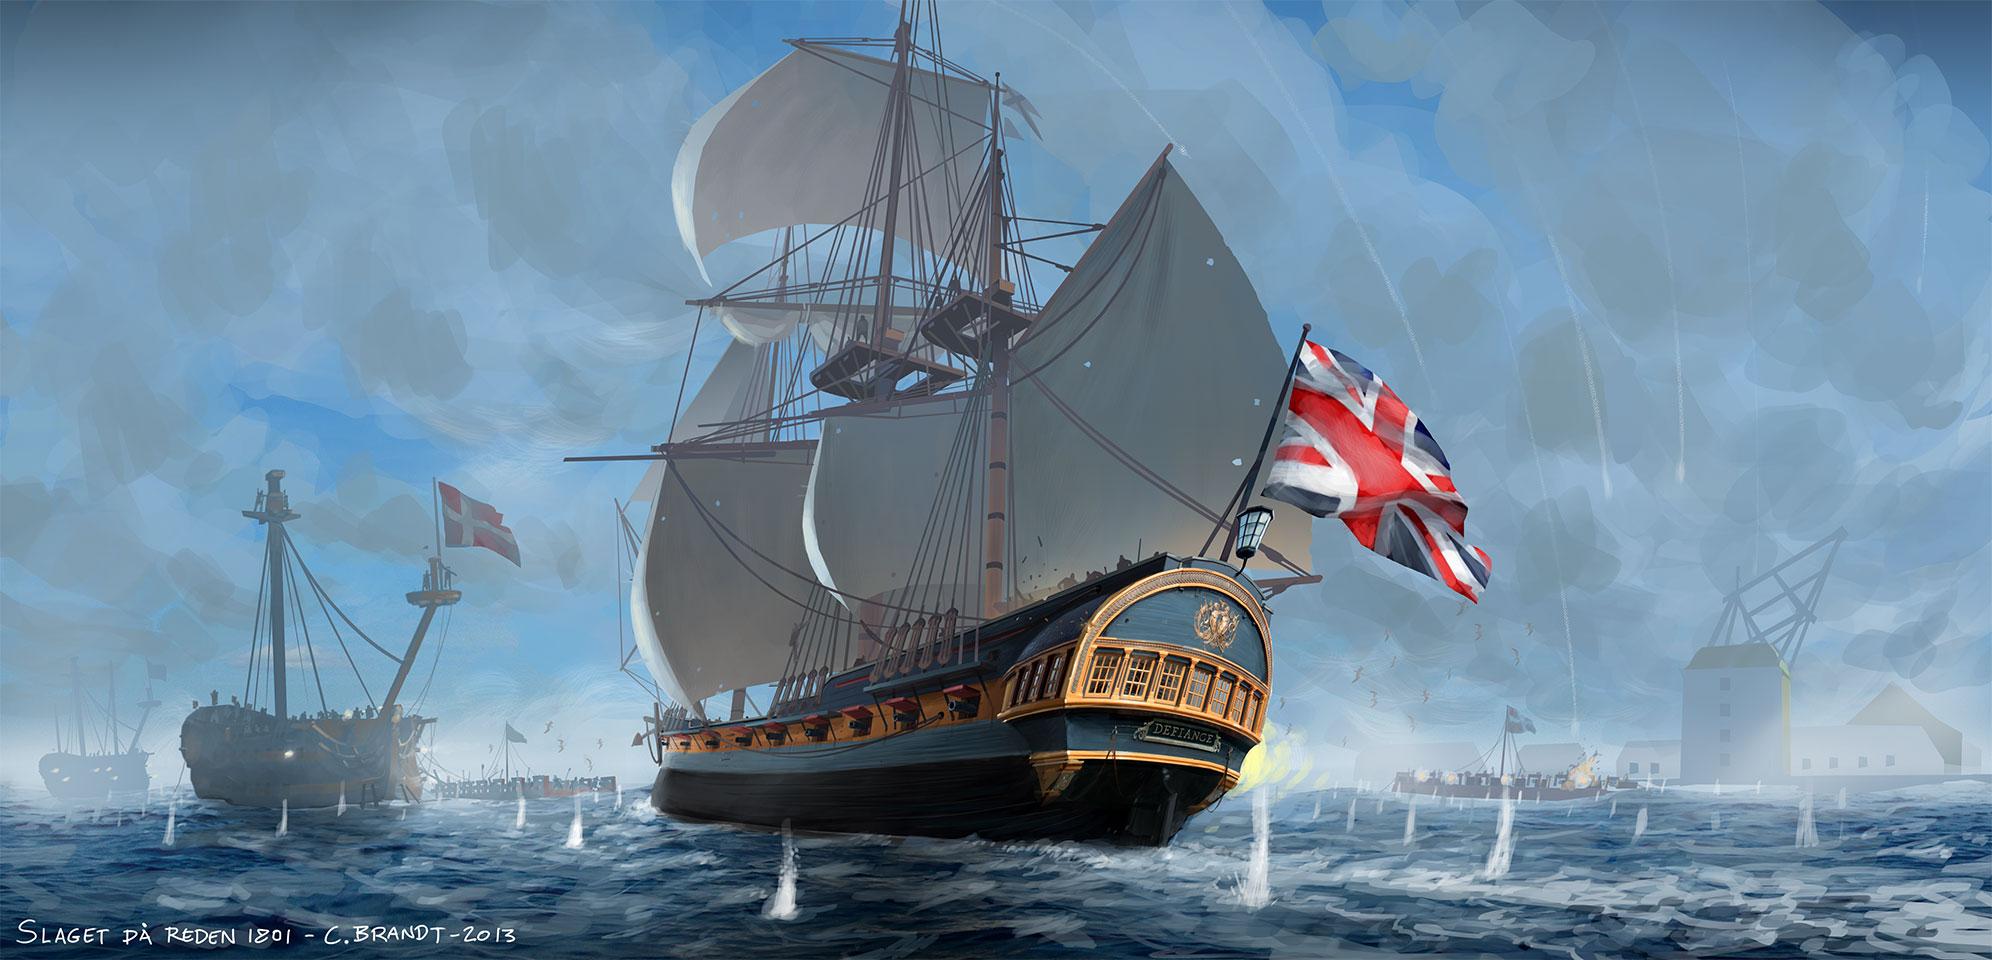 The Battle of Copenhagen 1801. Photoshop painting. Carsten Brandt 2013